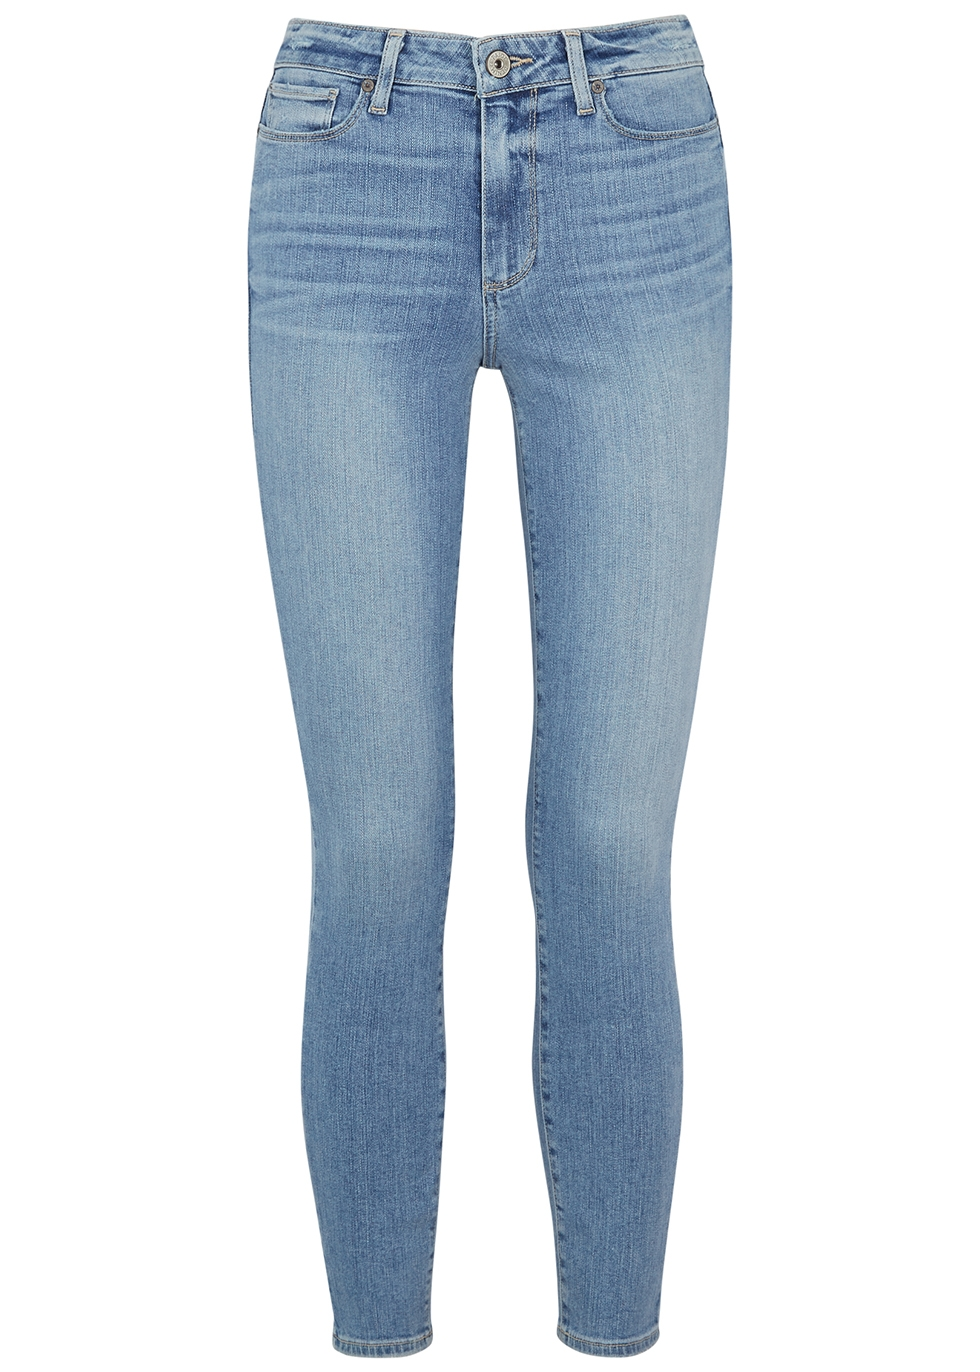 Hoxton Ankle light blue skinny jeans